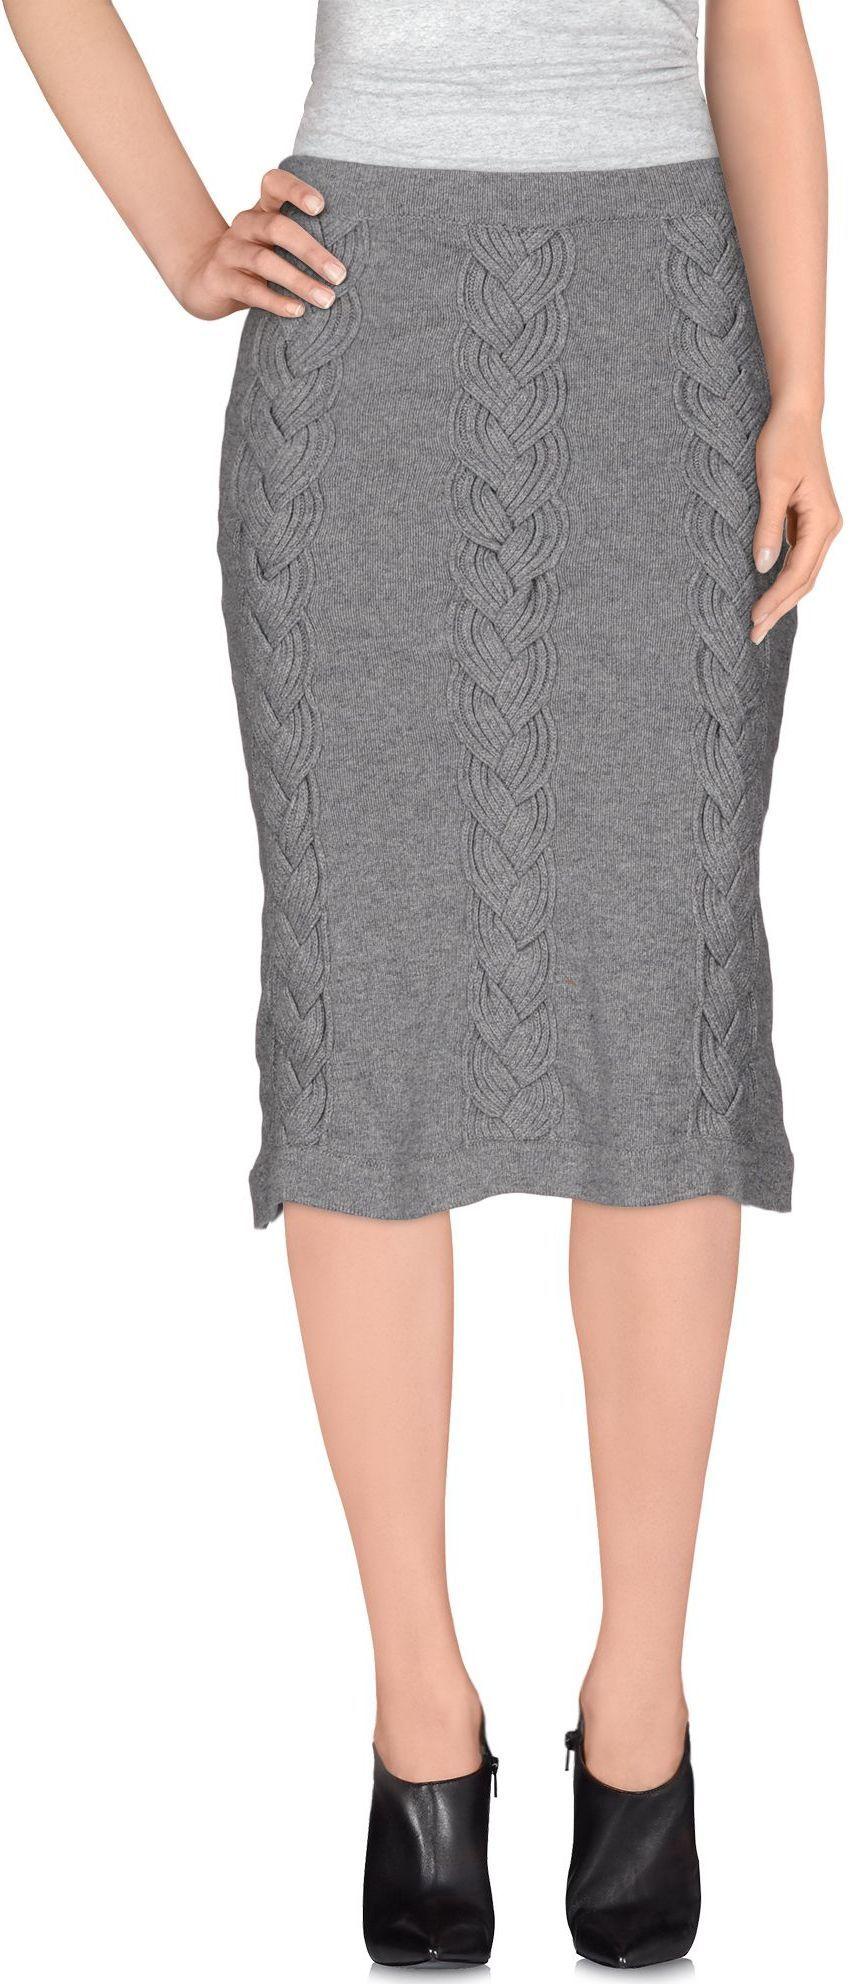 Jucca knit skirt 2b knit skirts pinterest knit skirt jucca knit skirt knitted skirtfree patternknitting bankloansurffo Images